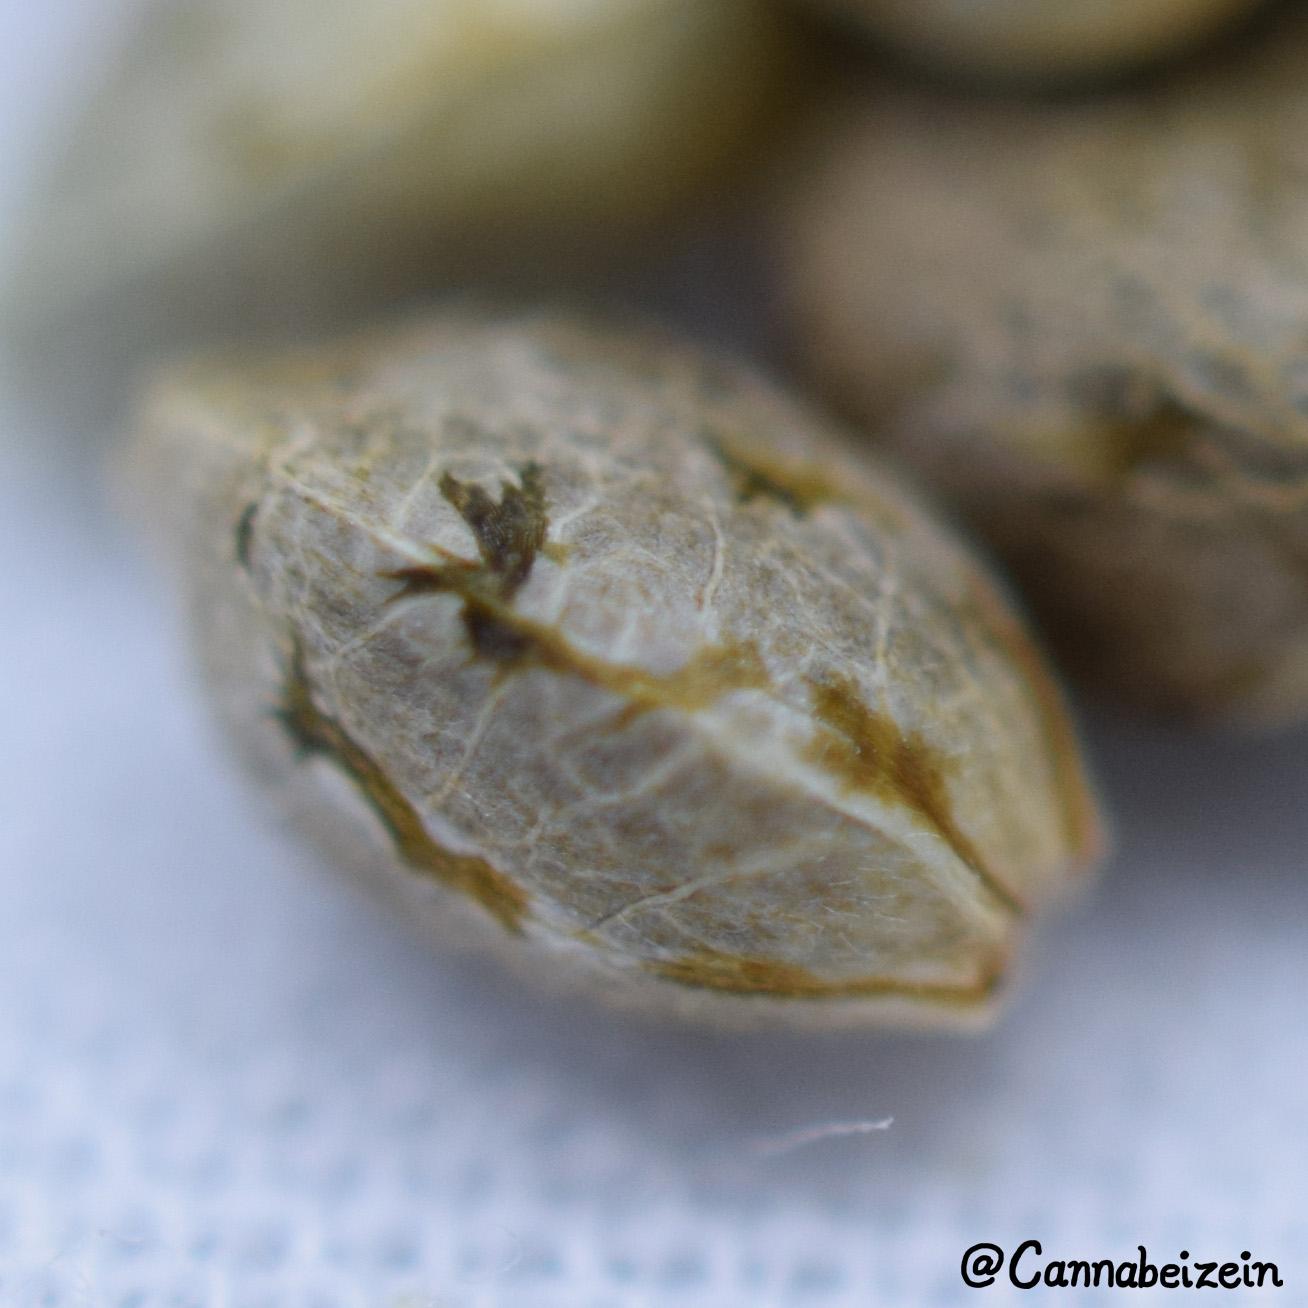 Cannabeizein 0235 - Mystery Mix Seeds - DSC_0831 copy.jpg